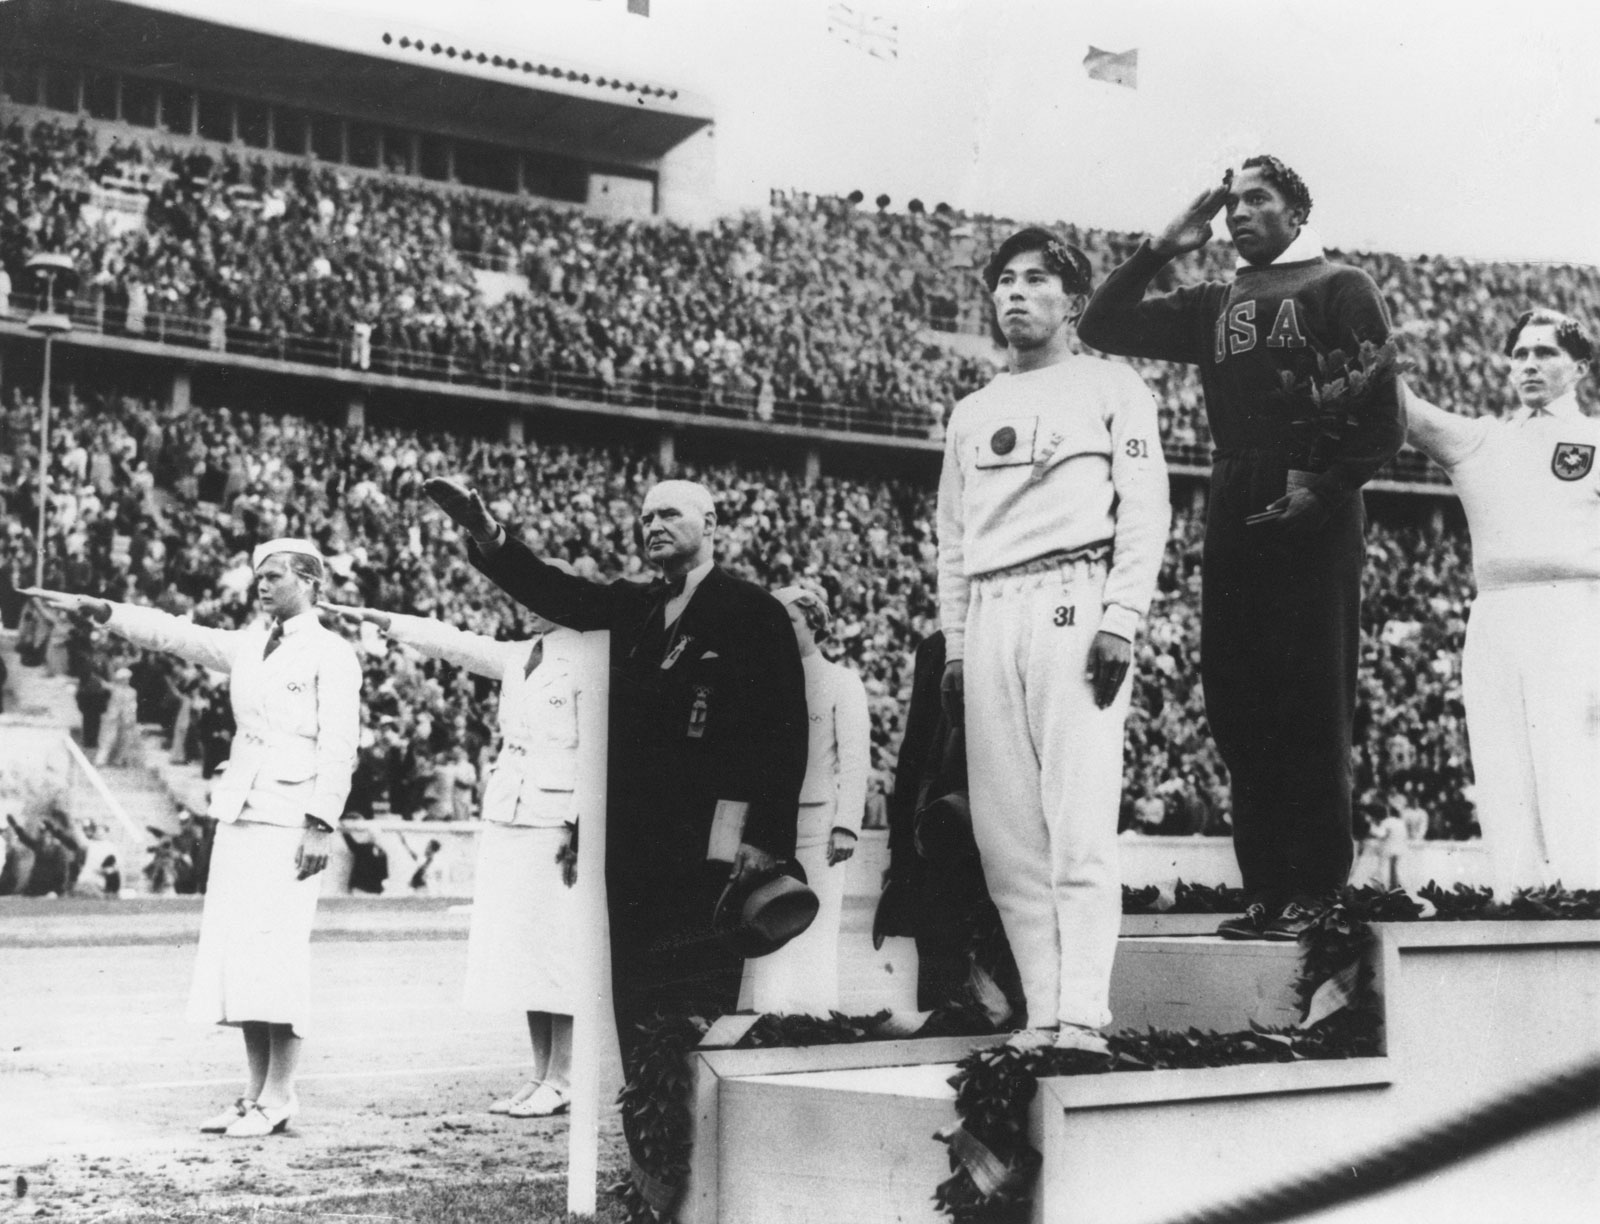 Jesse-Owens-podium-winners-gold-medal-1936-1936